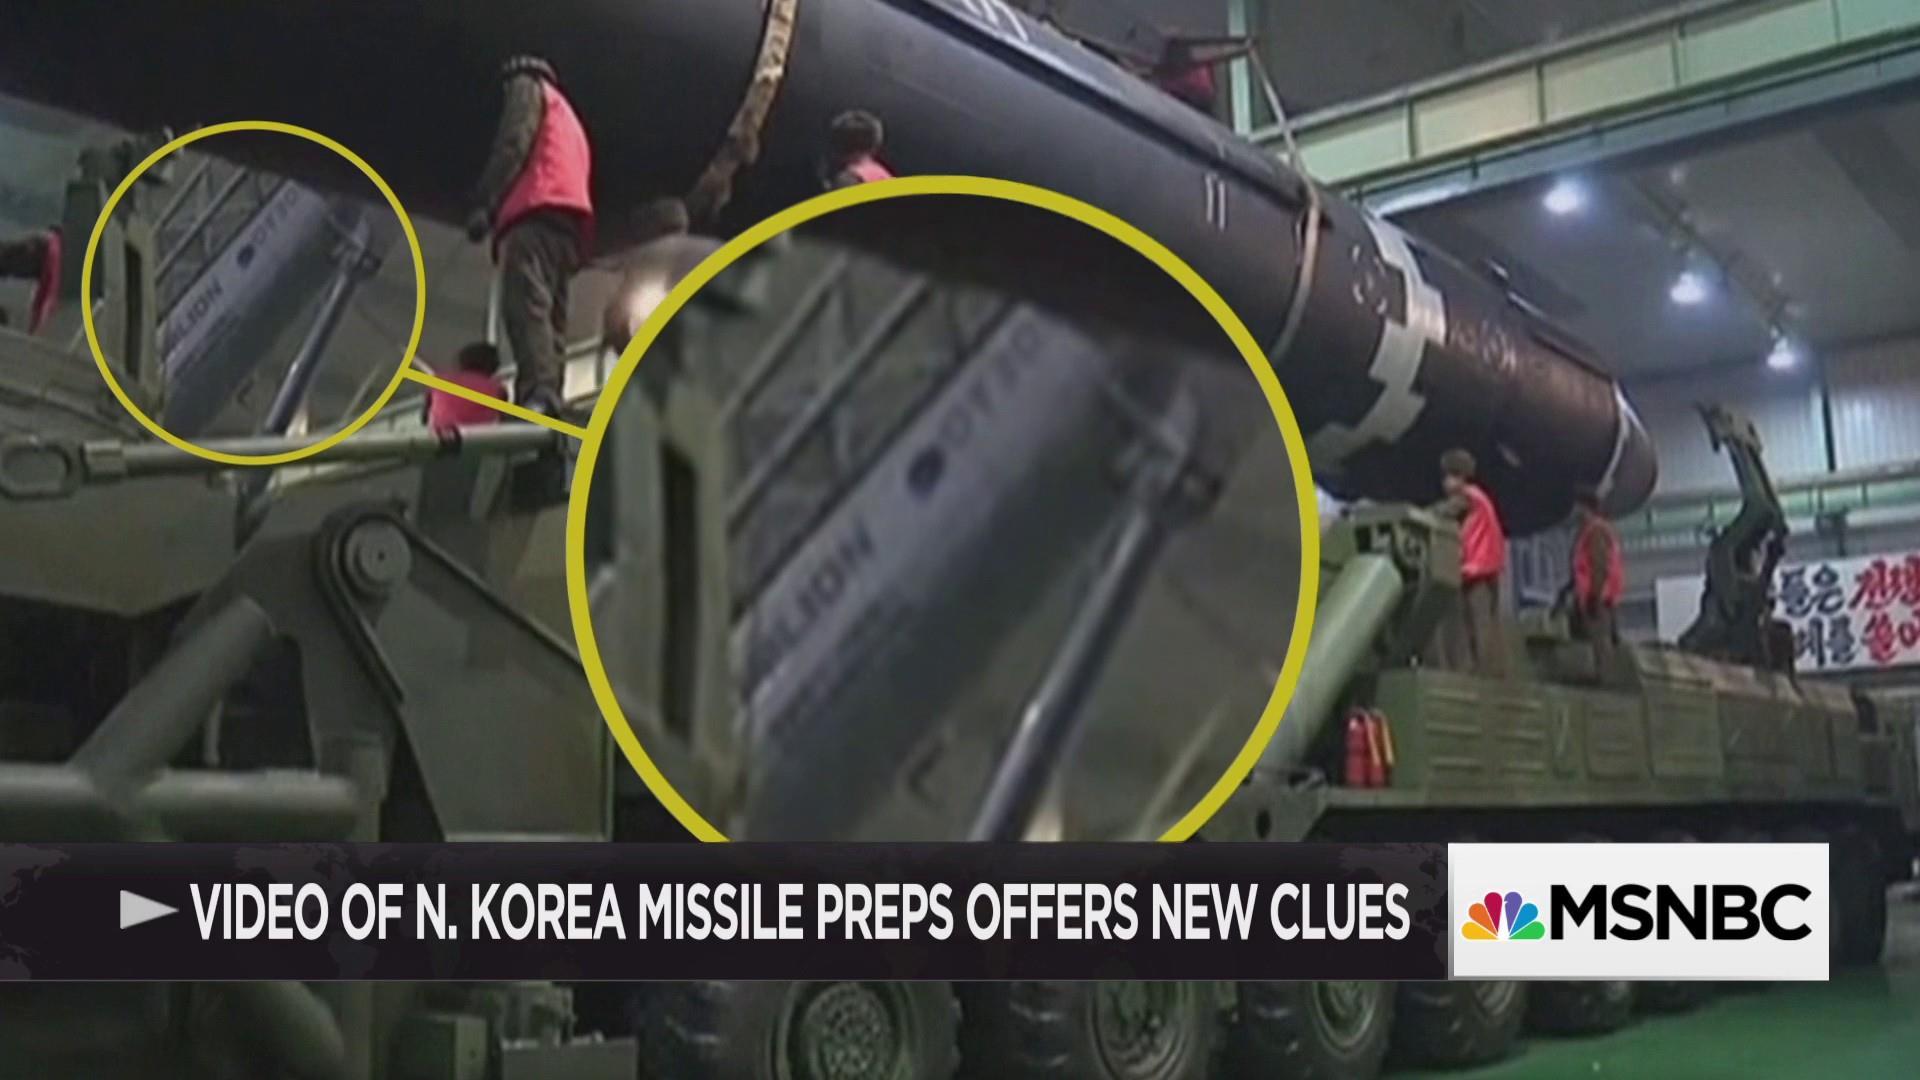 US academics track North Korea nuclear progress with public data